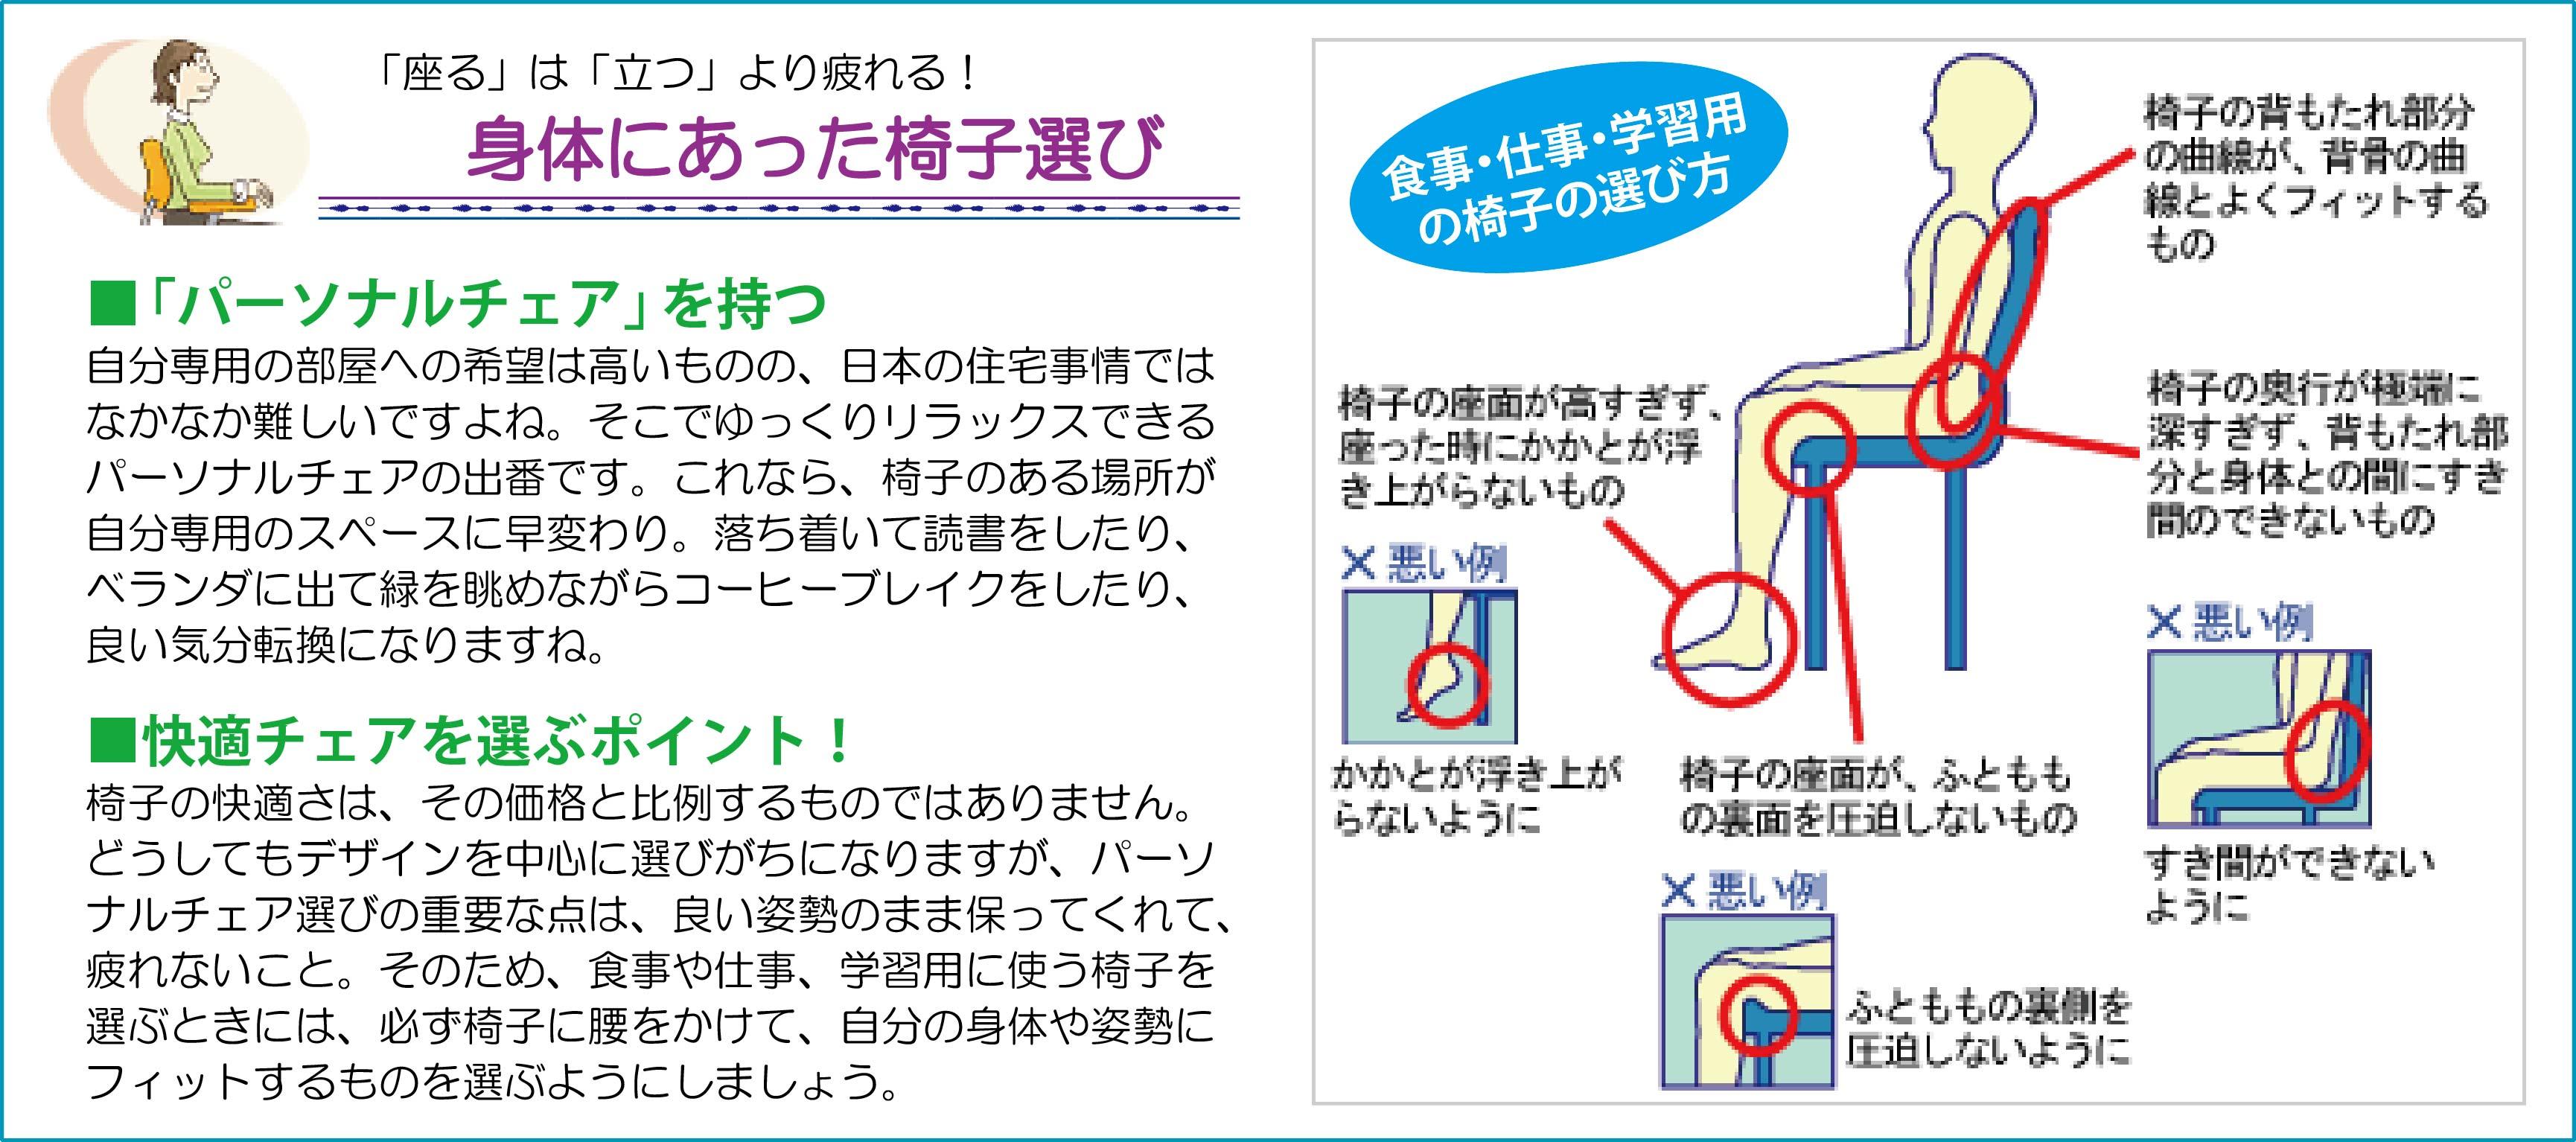 KuraSi-natu-sin85-14.jpg